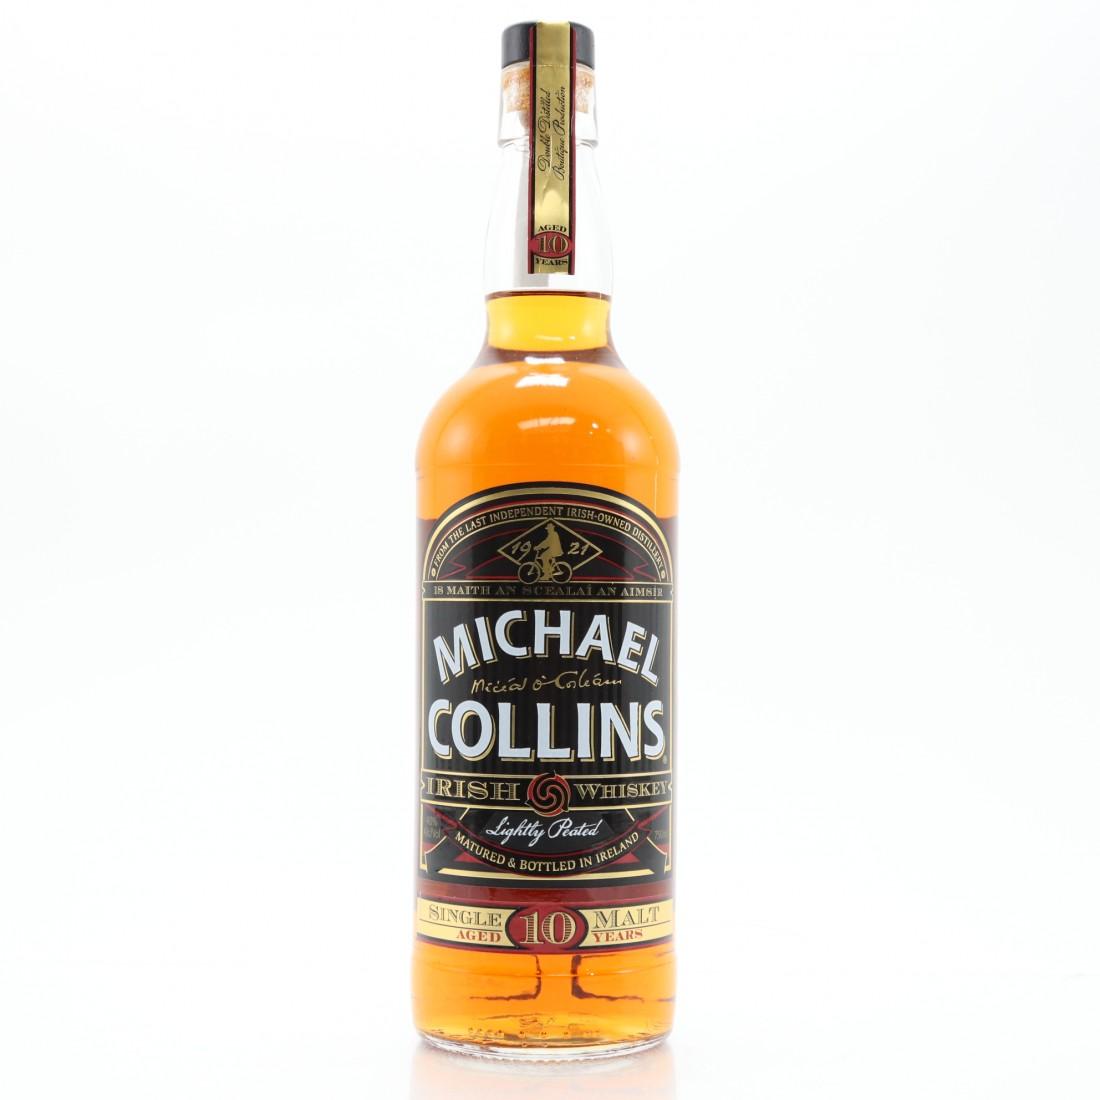 Michael Collins 10 Year Old Lightly Peated Single Malt Irish Whiskey